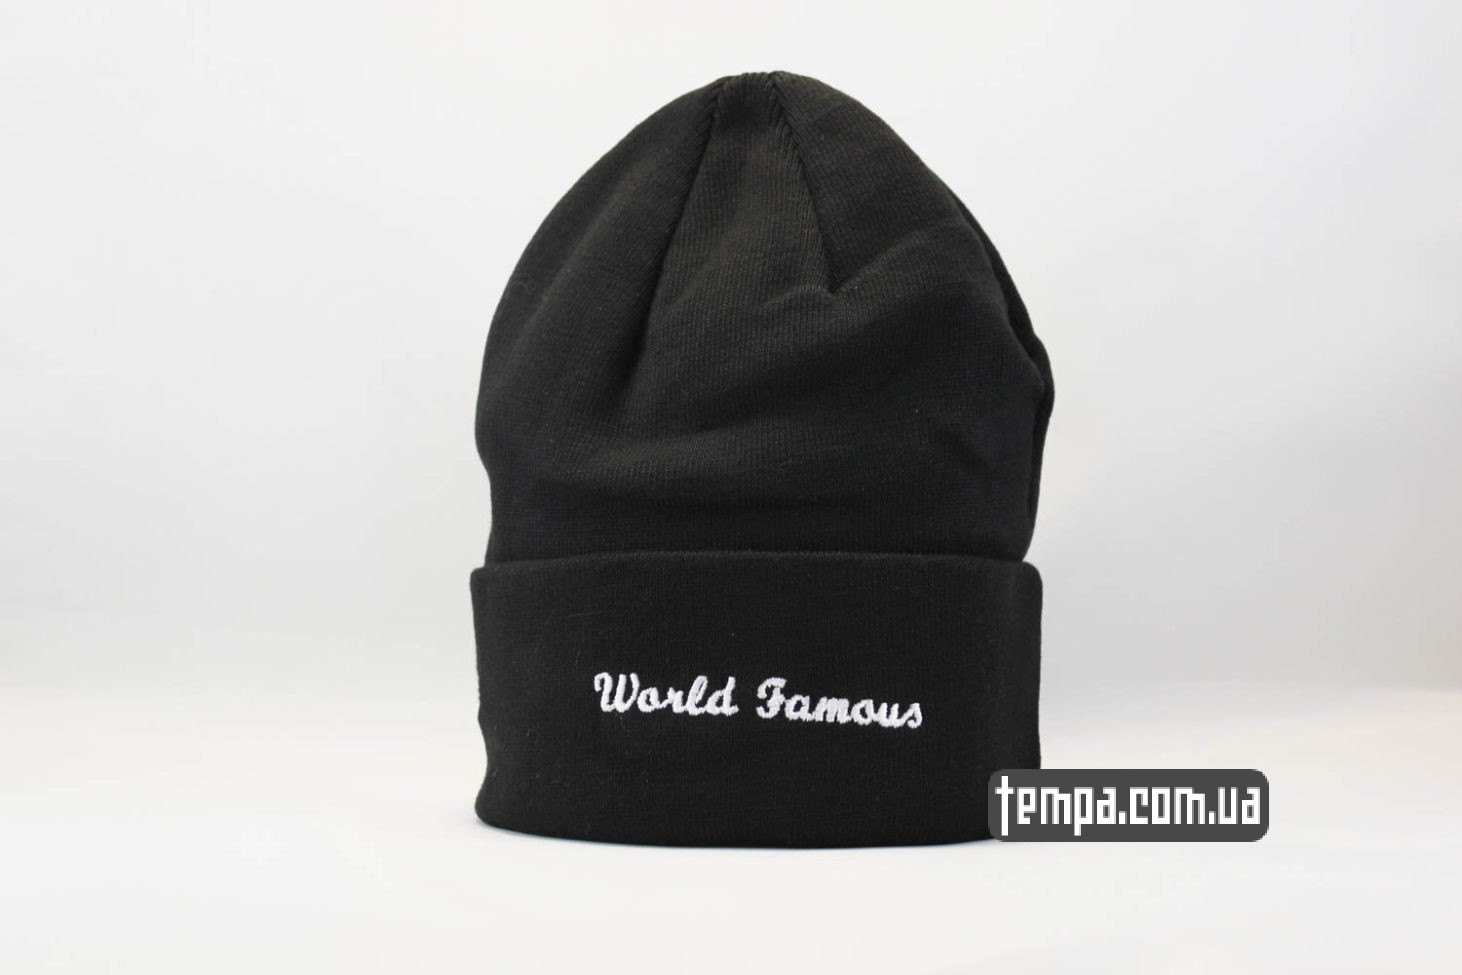 world famous supreme шапка beanie SUPREME Black черная суприм Украина